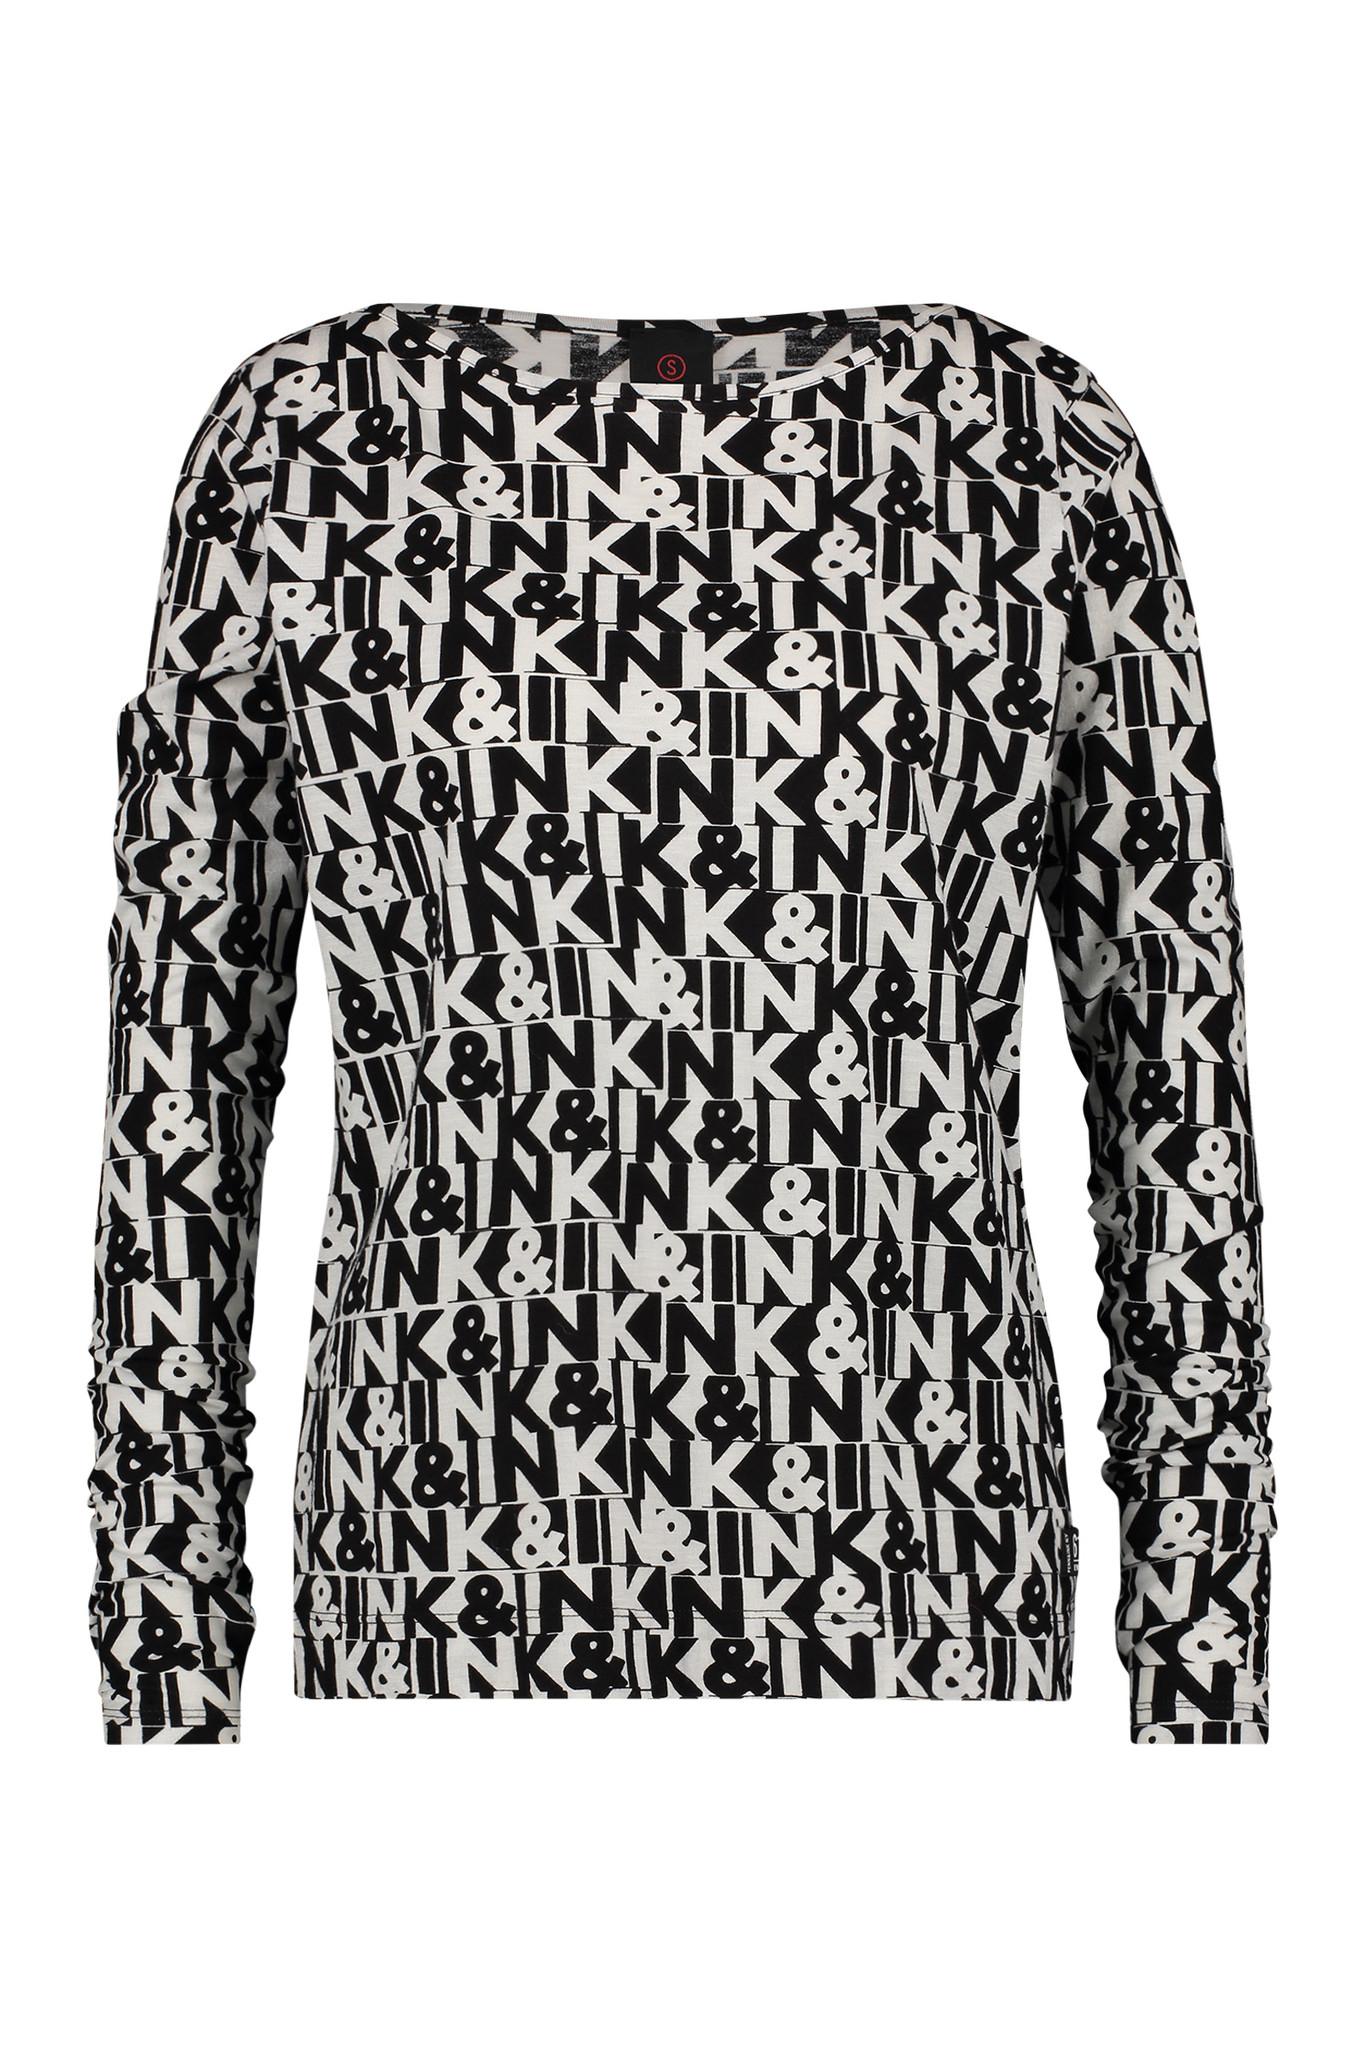 Zwart/wit lange mouw dames shirt Penn & Ink - W19F649